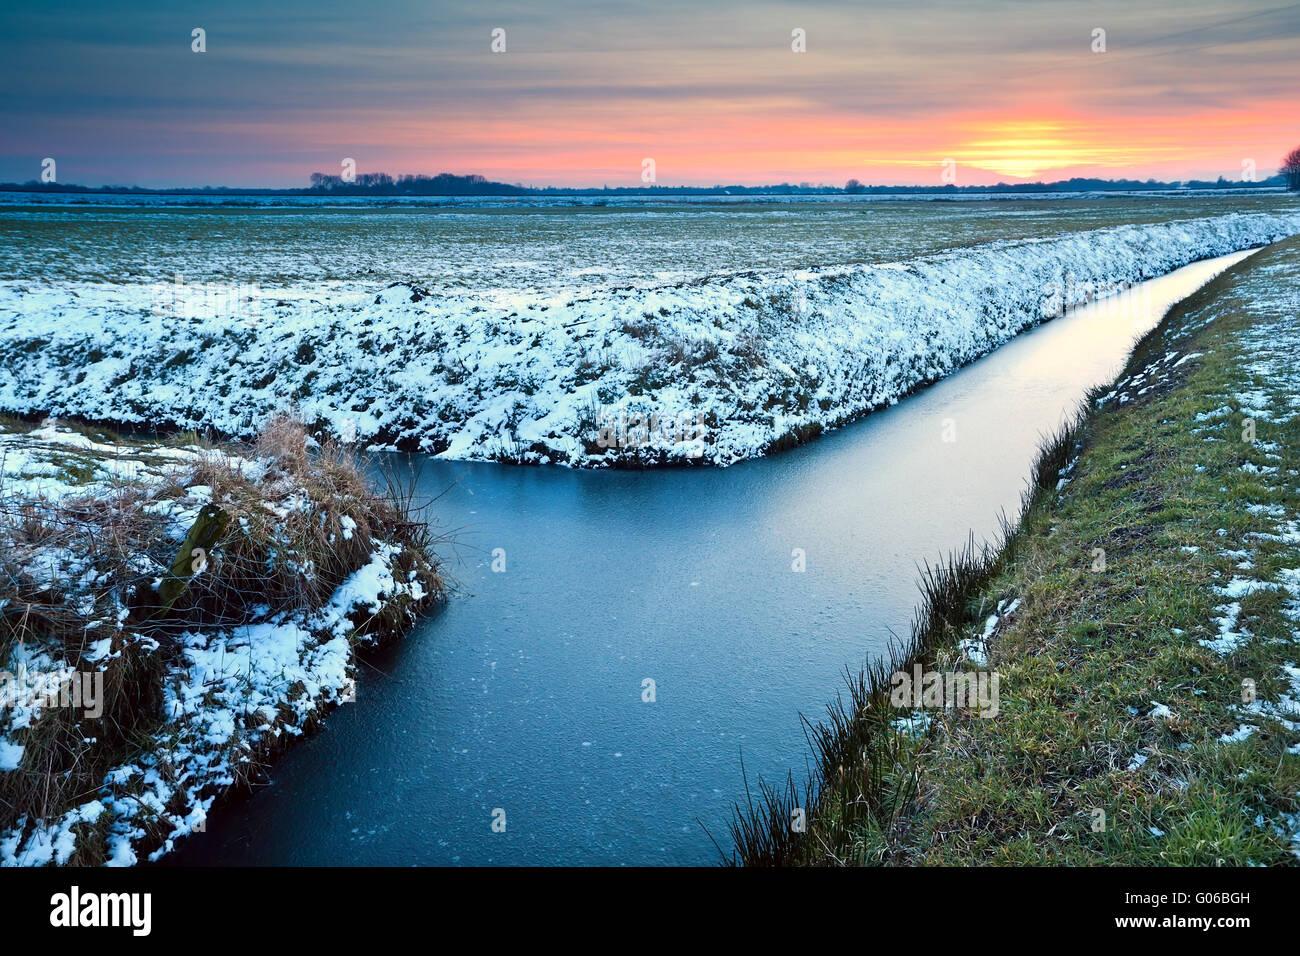 Sonnenuntergang über Winter Wiesen Stockbild